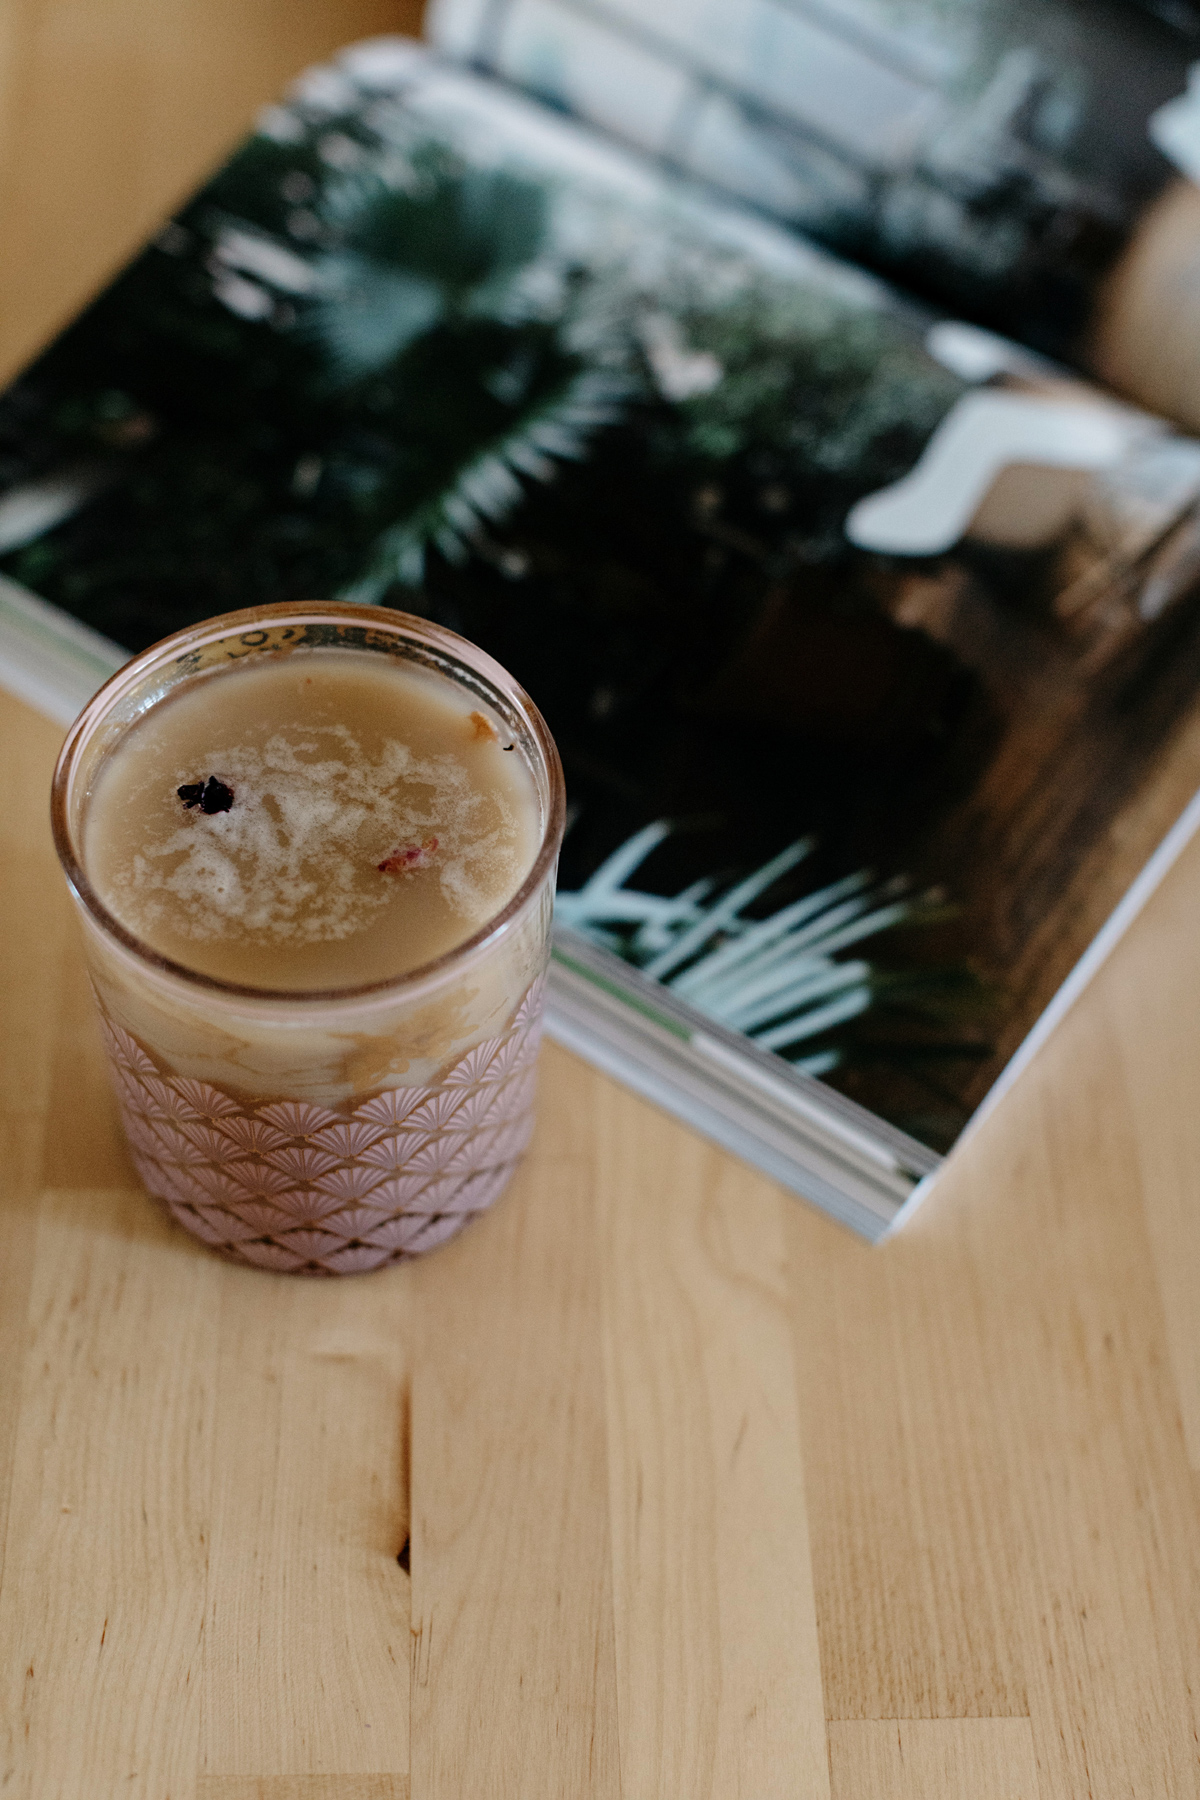 003-tea-pressa--lifestyle--blogger--tea--shark-tank--lifestlye-blog.jpg